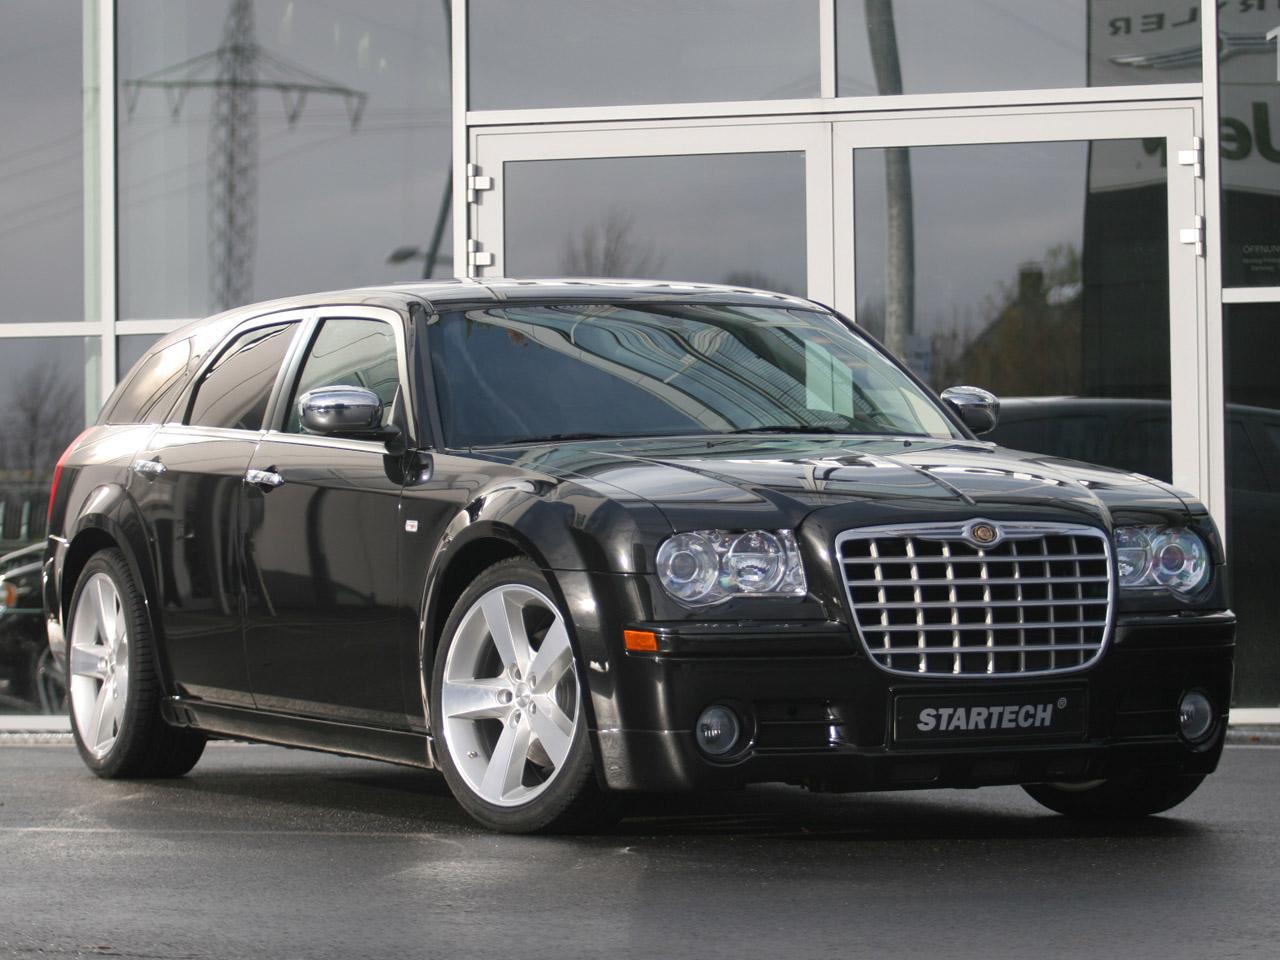 Галерея » Автомобили Chrysler - фото машин